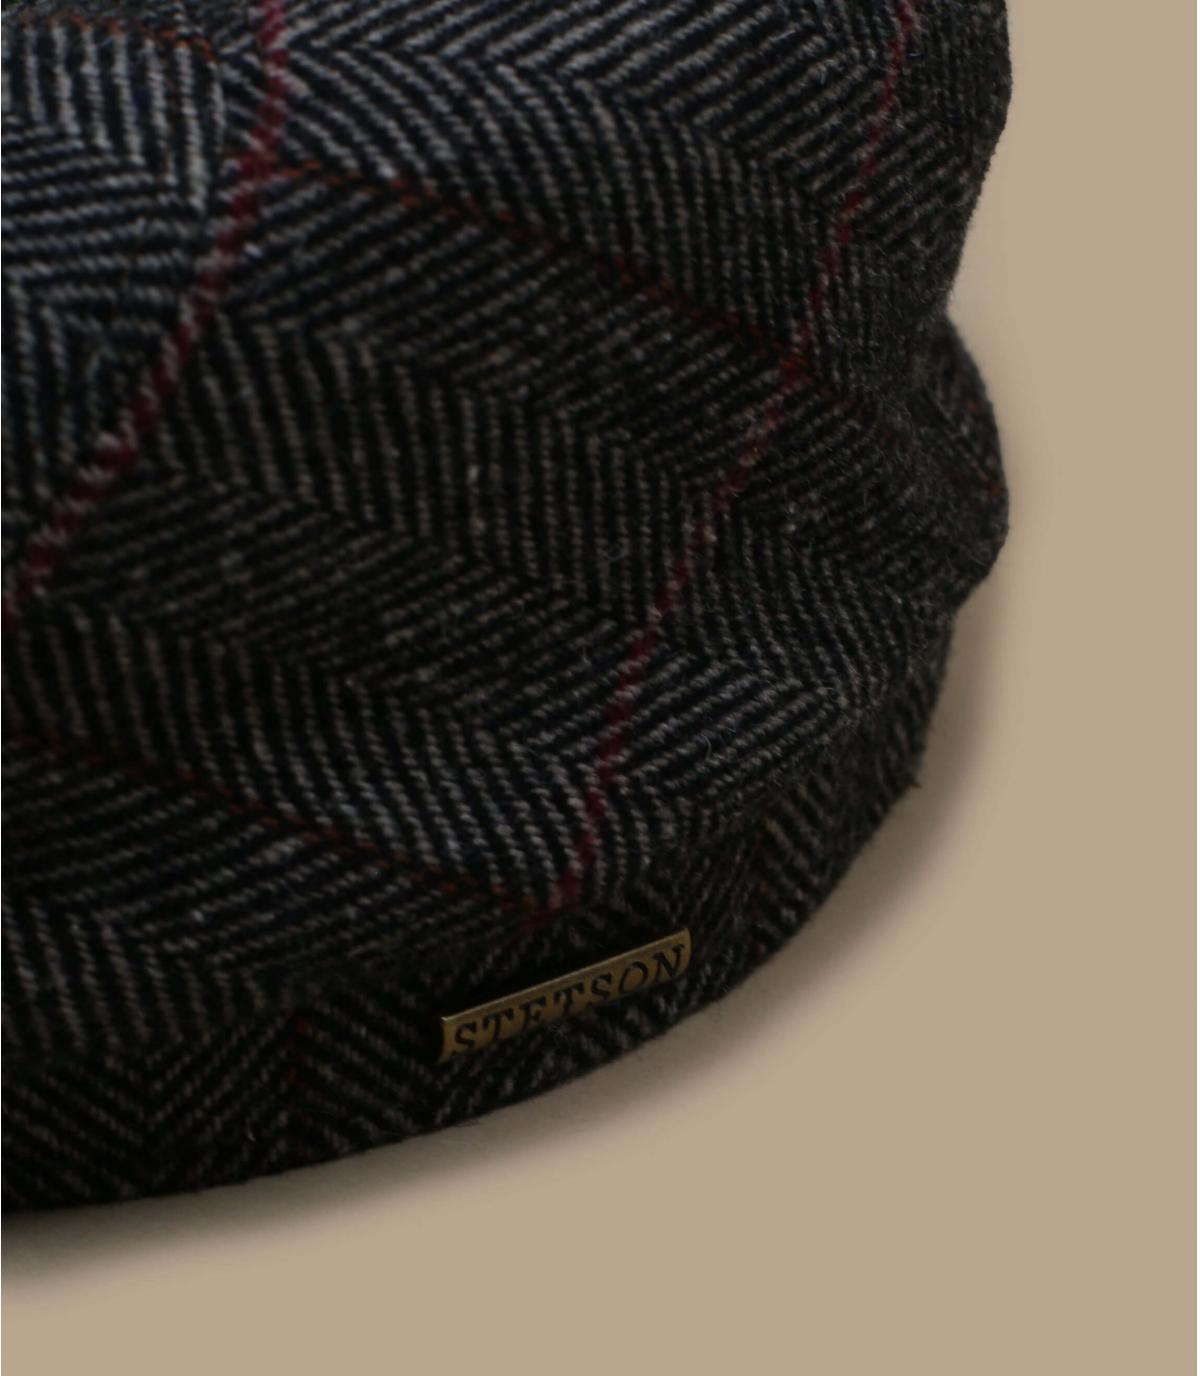 Wool newboys cap